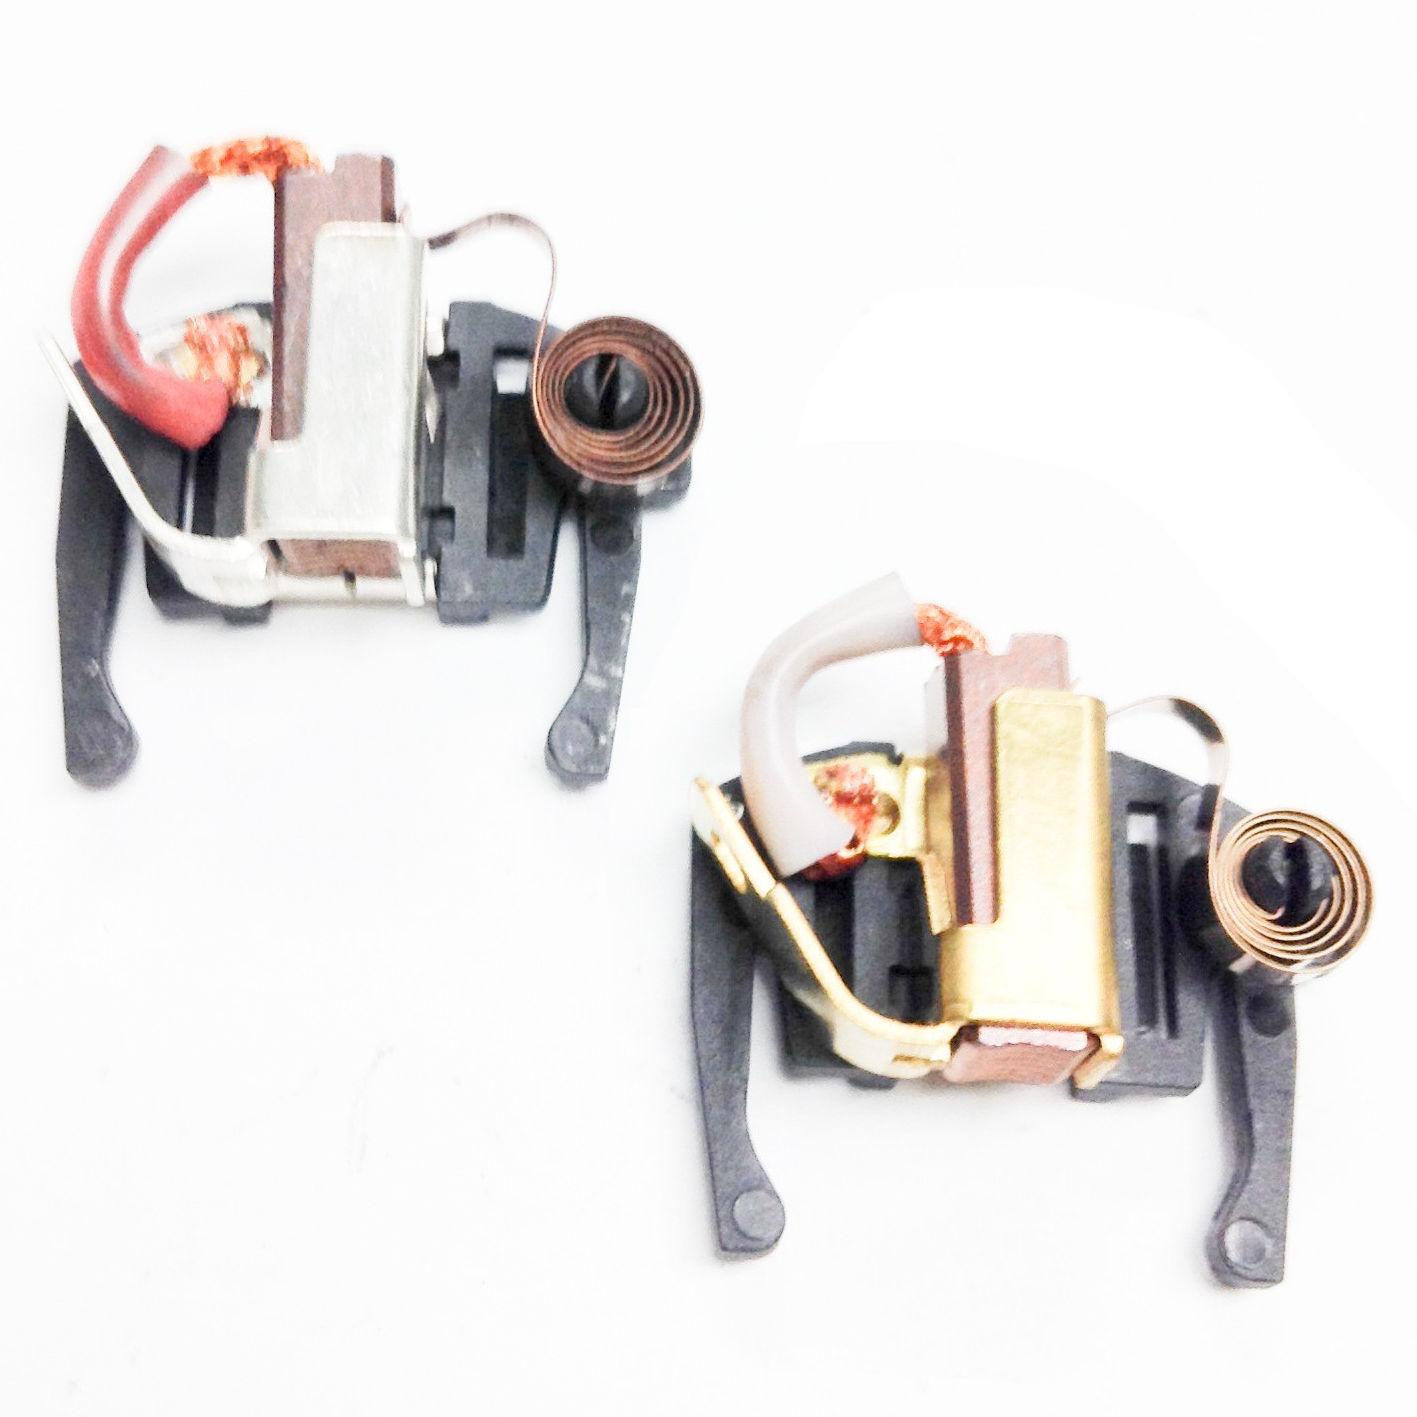 Electric Motor Brush Caps